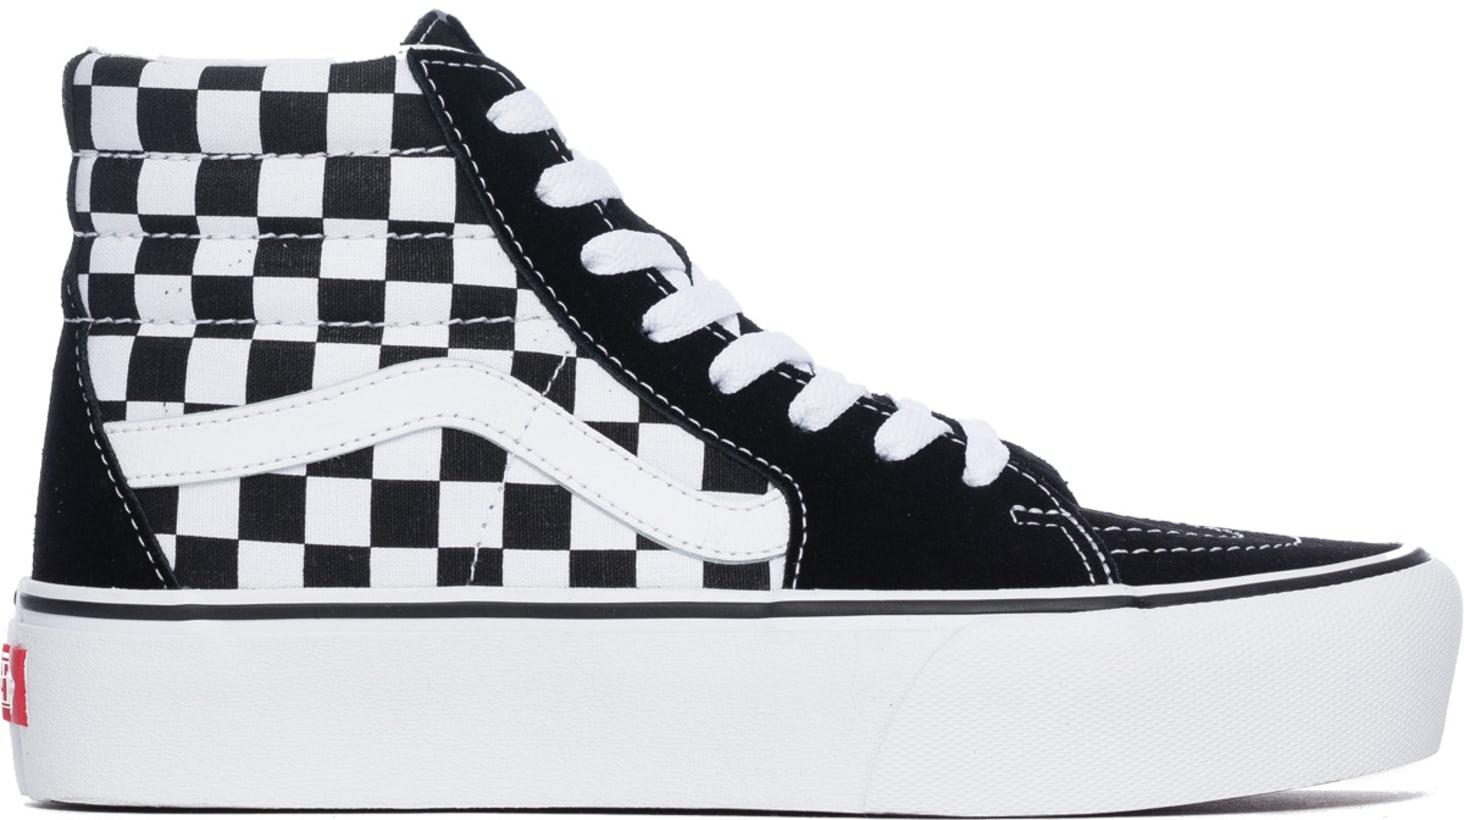 fe300570cb4 Vans: SK8-Hi Platform 2.0 - Checkerboard/True White   influenceu